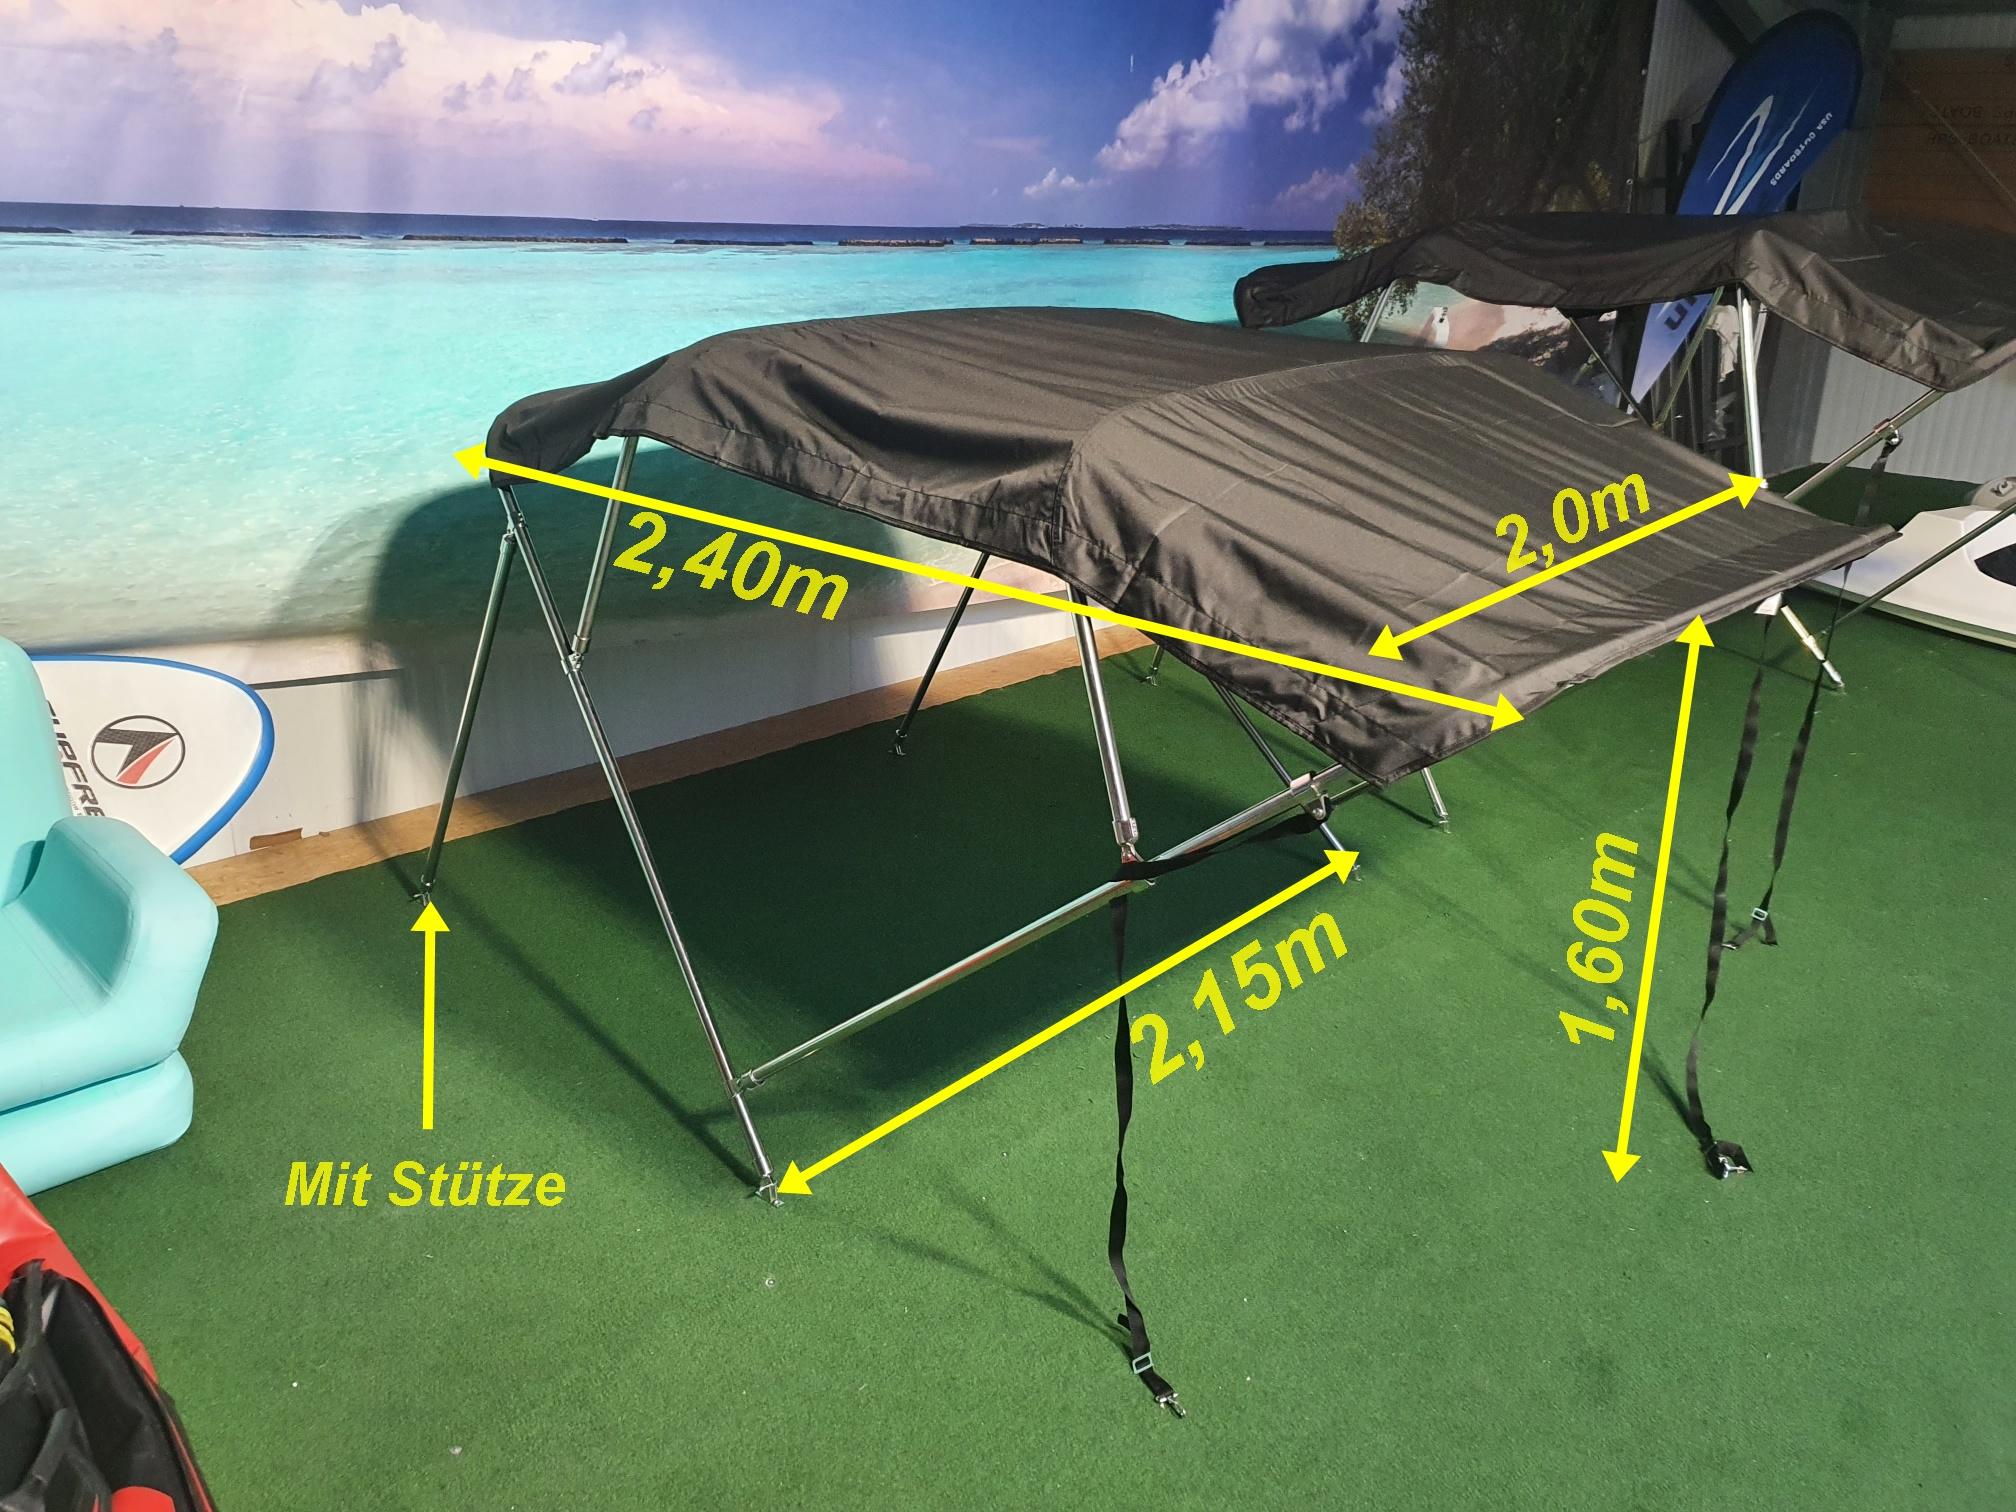 Bimini Top 2,15m -2,25m in Edelstahl in Grau für GFK Boot oder Schlauchboote